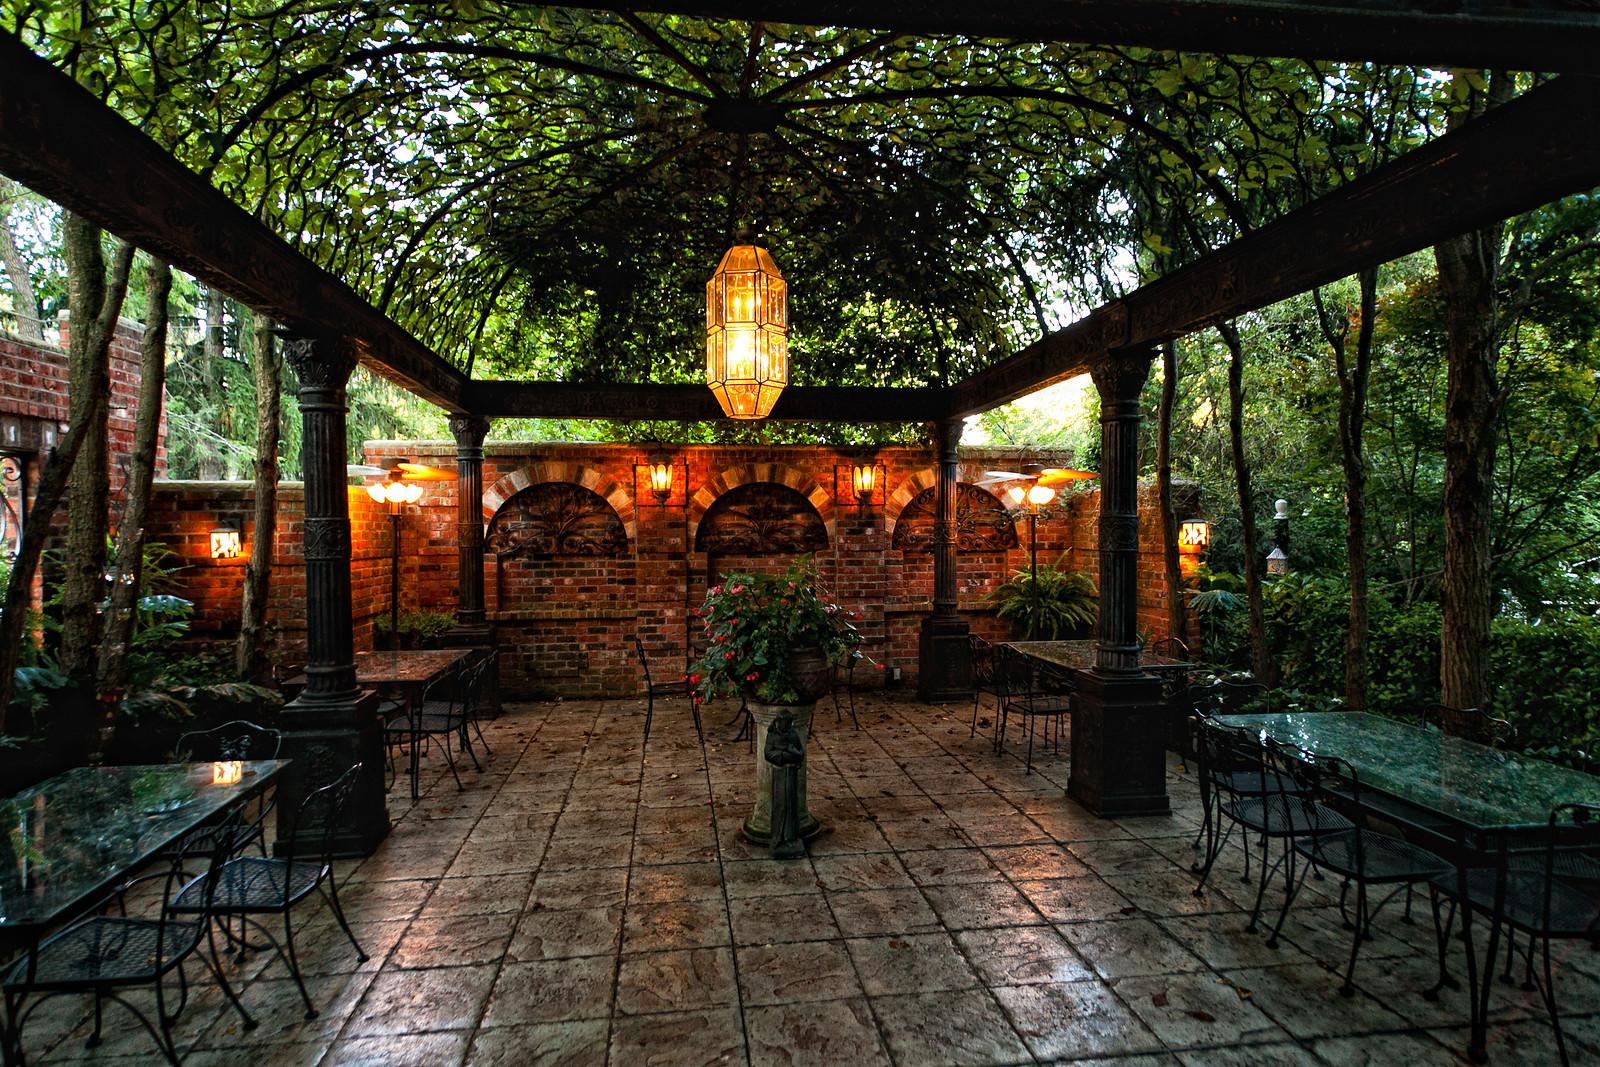 Current And Luxury Garden Design | Home design on Luxury Backyard Design id=81322